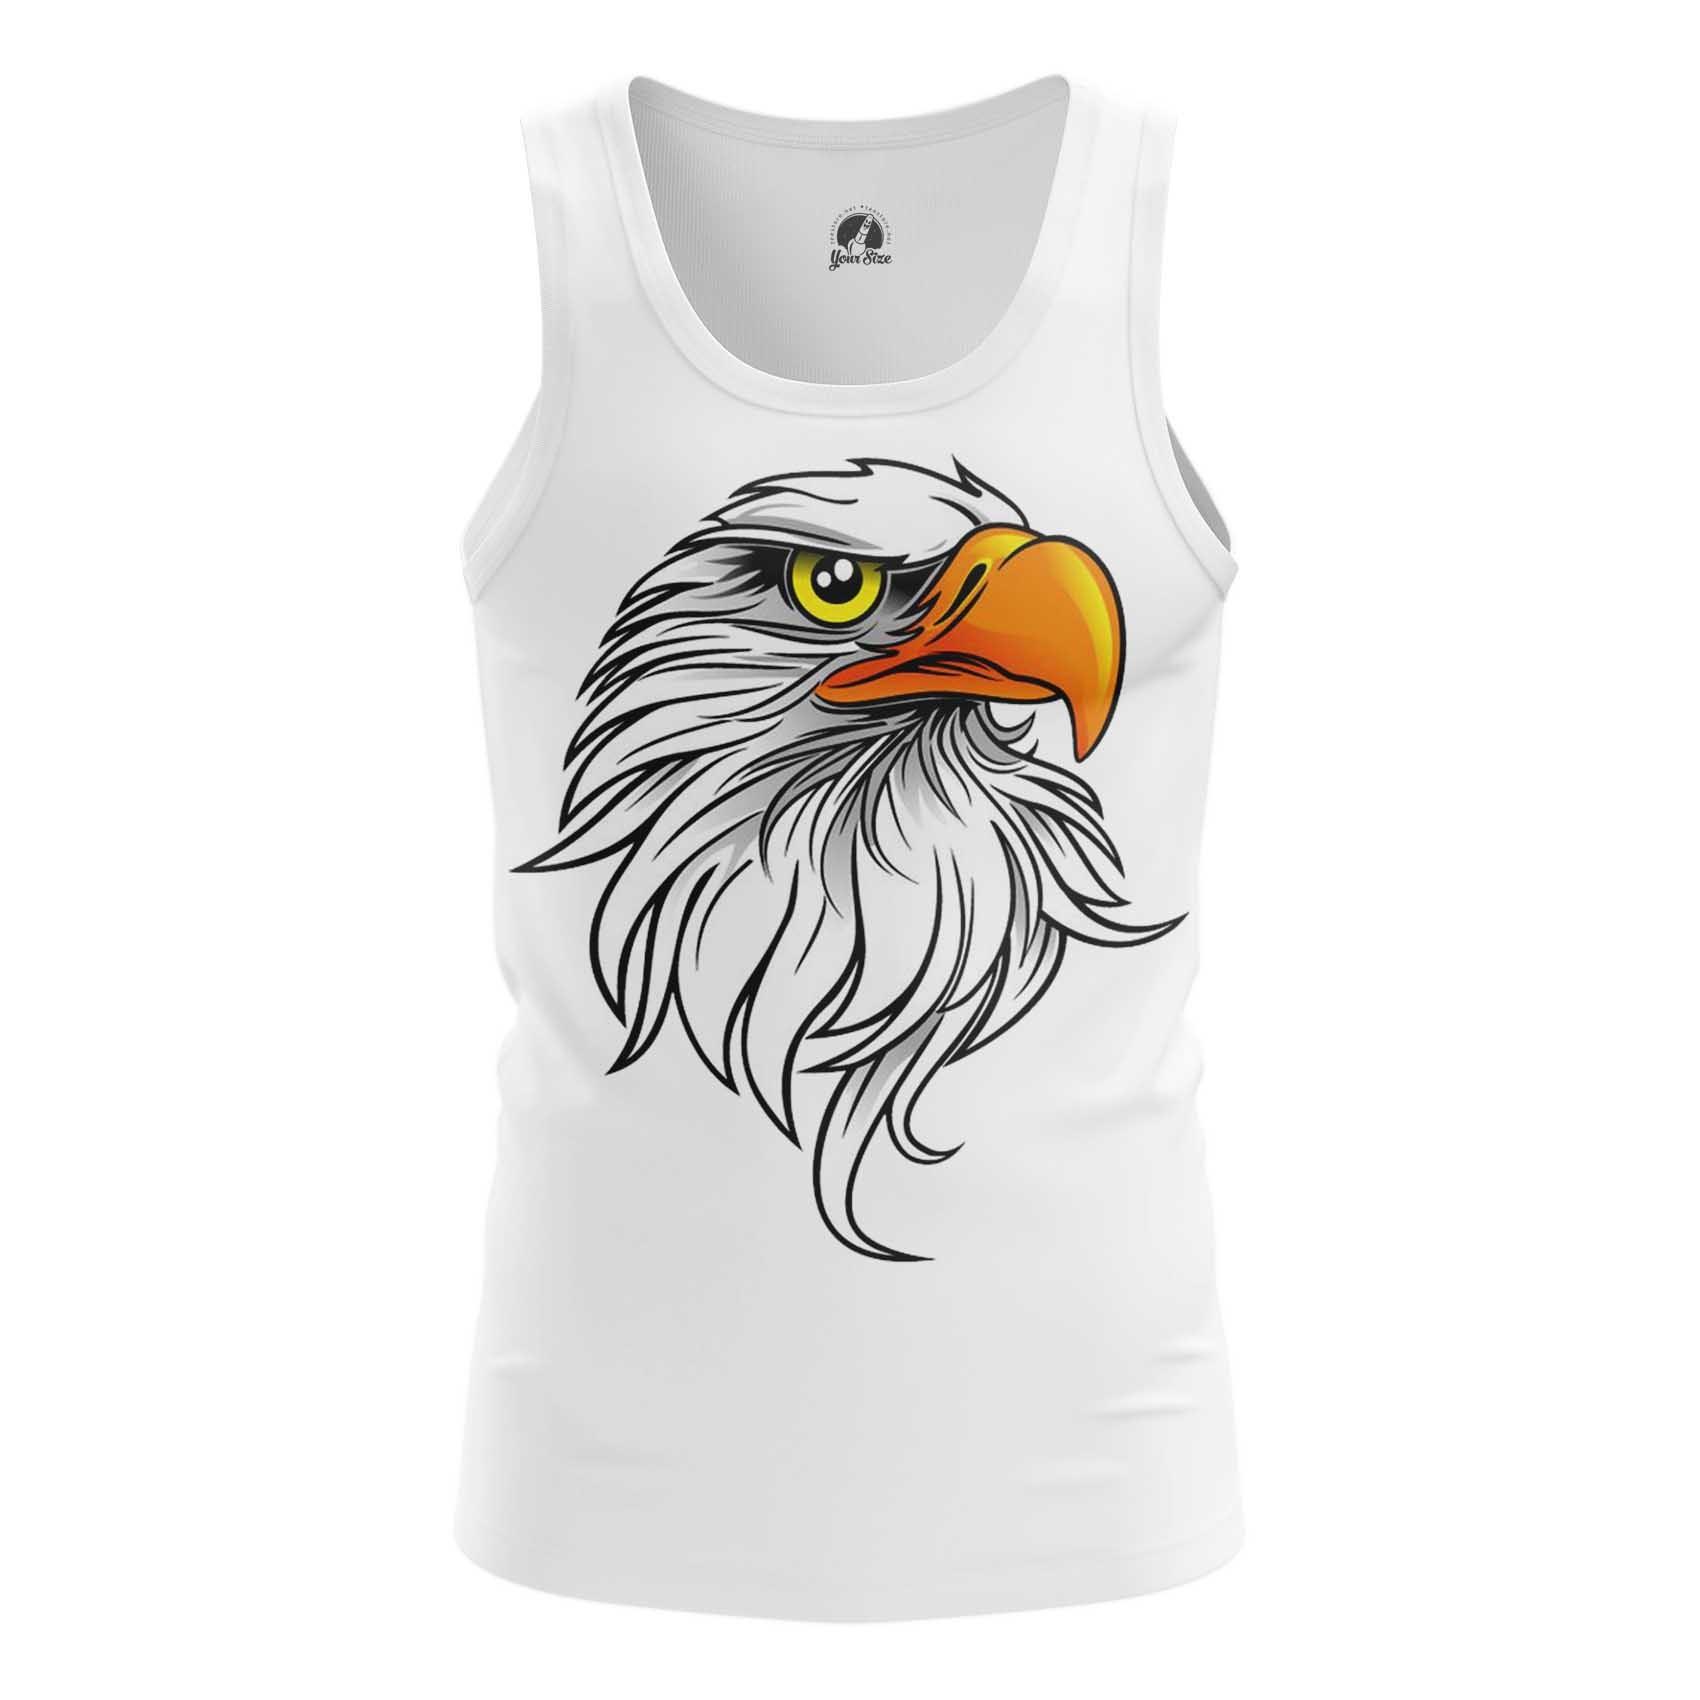 Collectibles T-Shirt Rock Eagle Head Print White